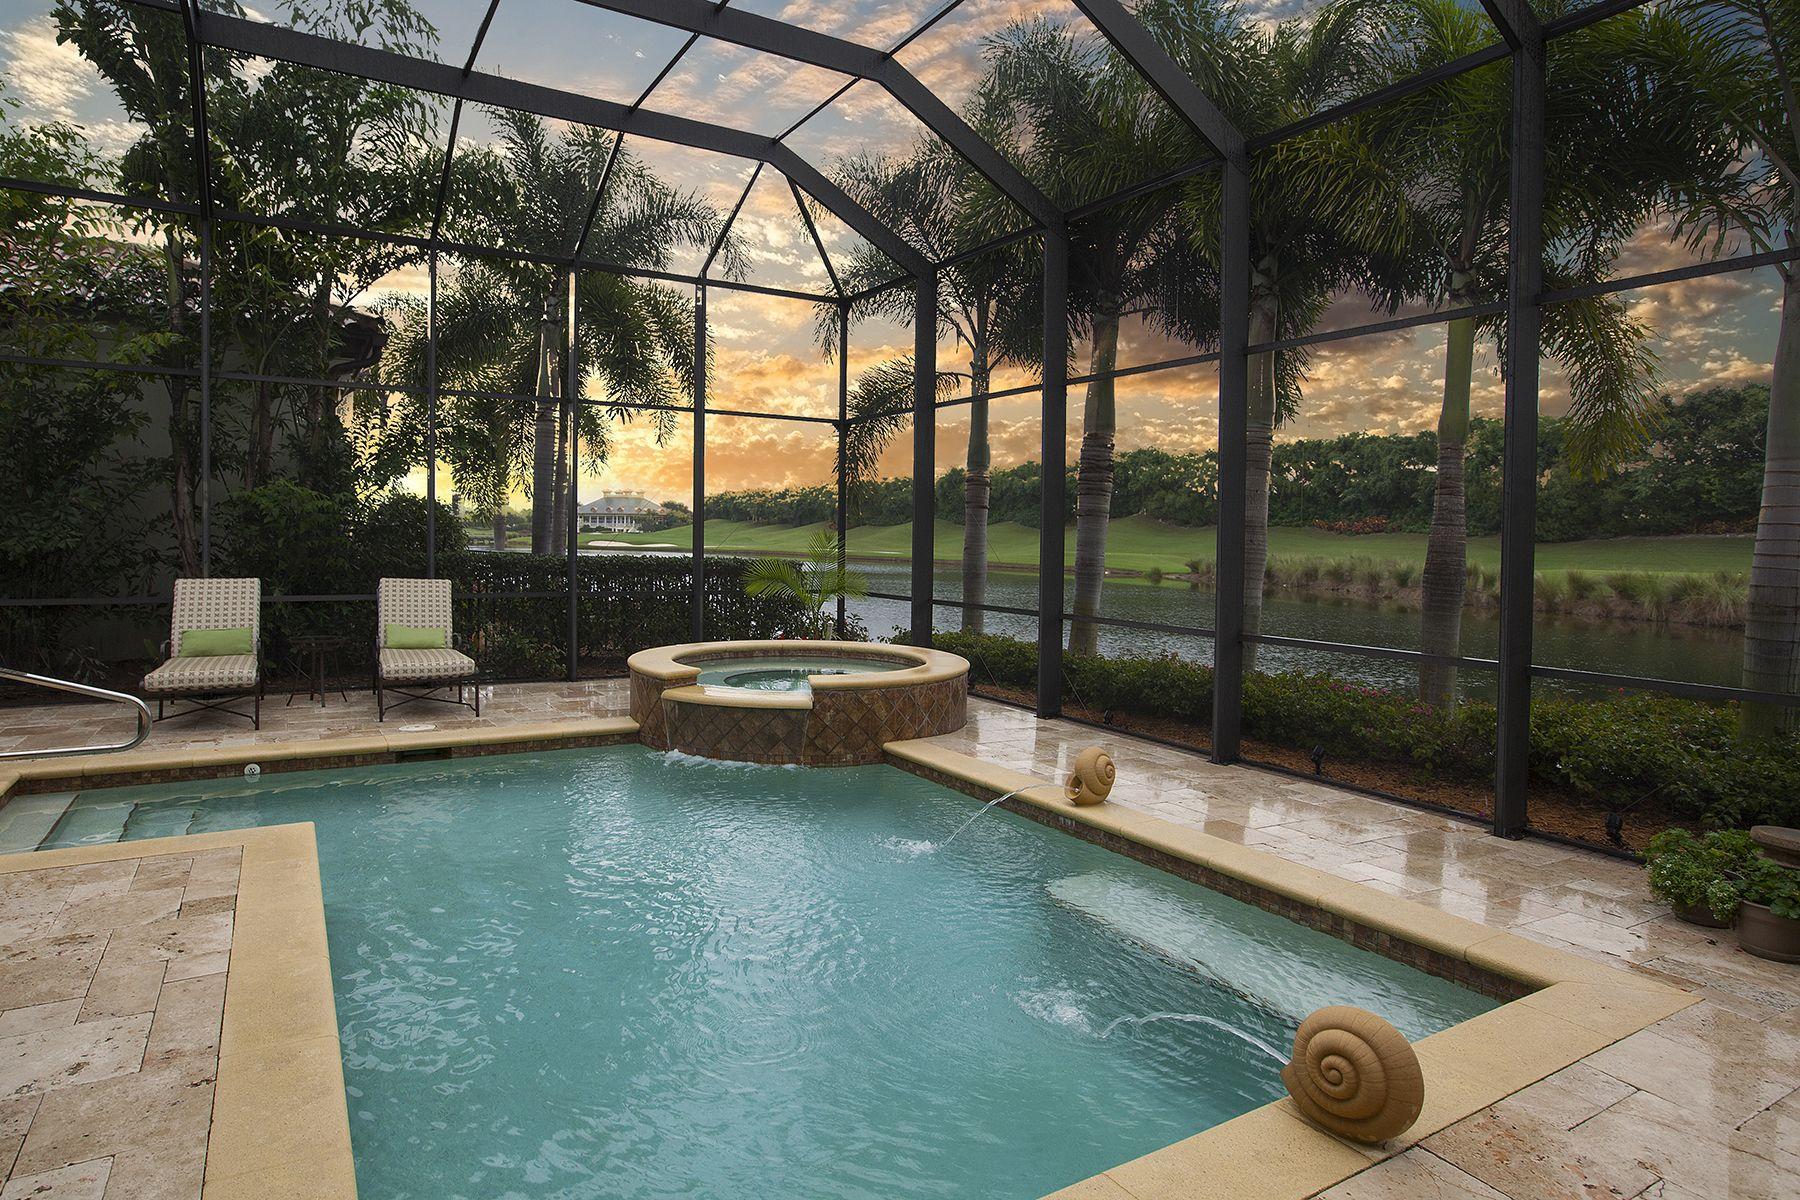 Naples Florida Estuary At Grey Oaks Visit Our Website At Premiersothebysrealty Com For Property Details And Addition Backyard Pool Florida Pool Pool Houses